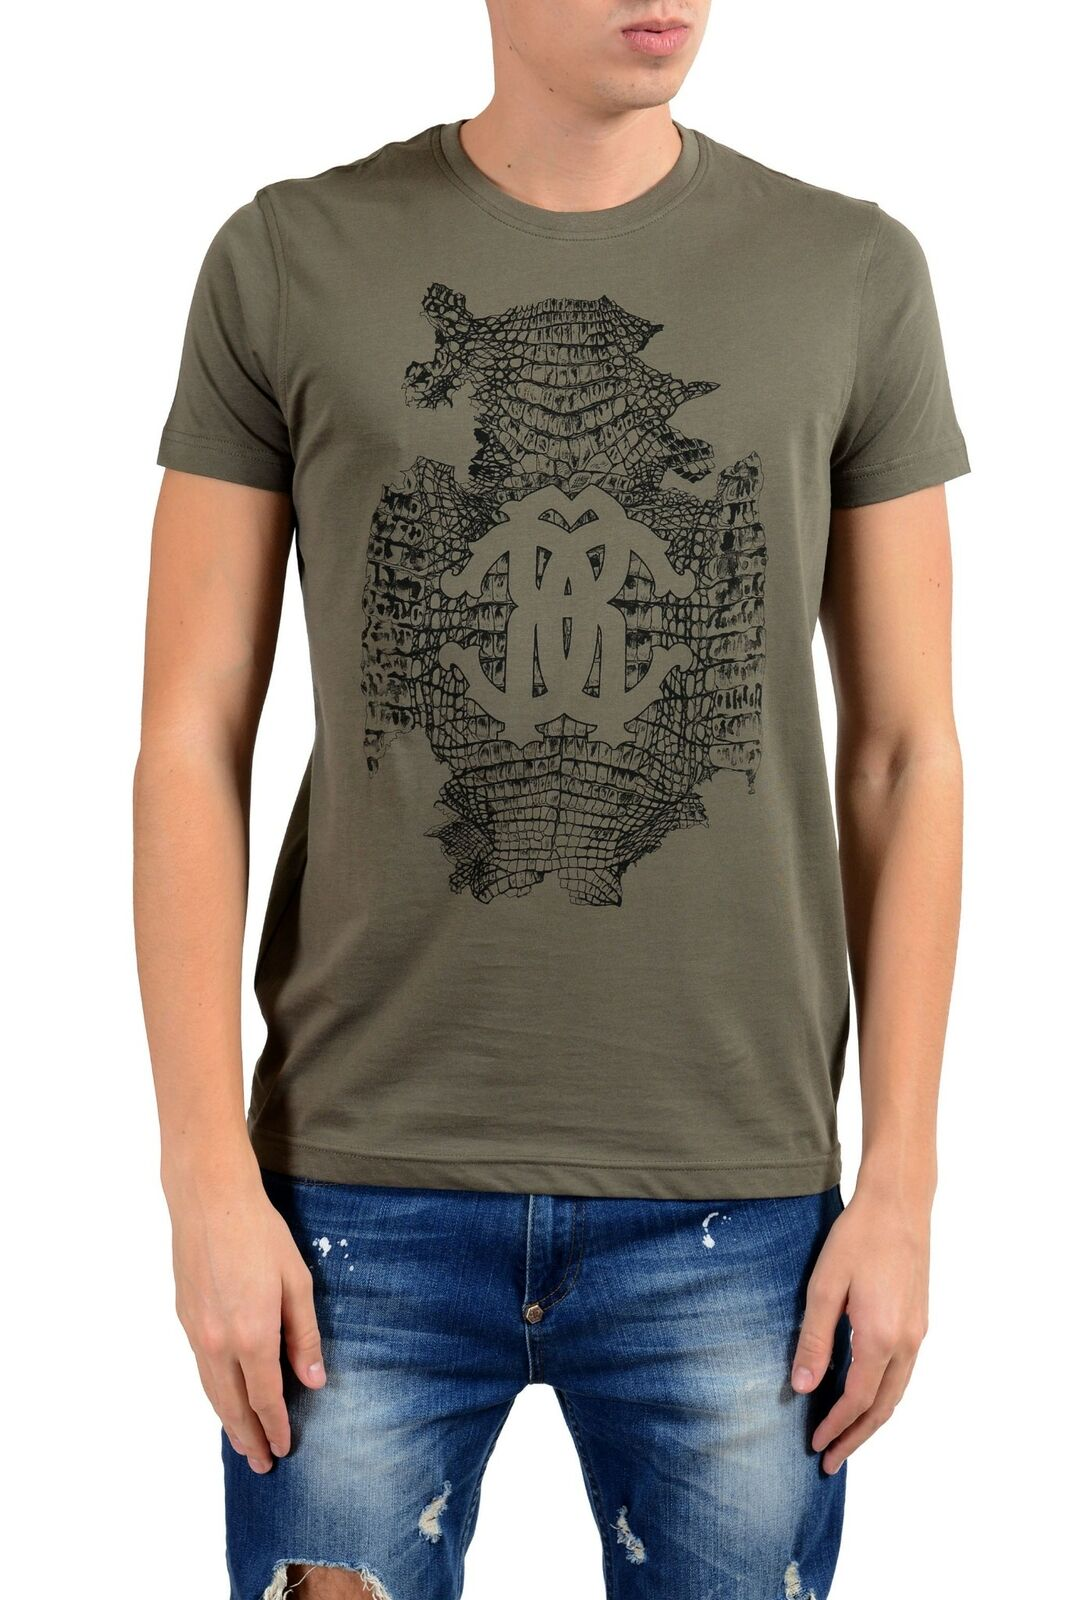 Roberto Cavalli Herren Herren Herren Olivgrün Grafik Rundhalsausschnitt T-Shirt  | Moderne Technologie  9f4b87